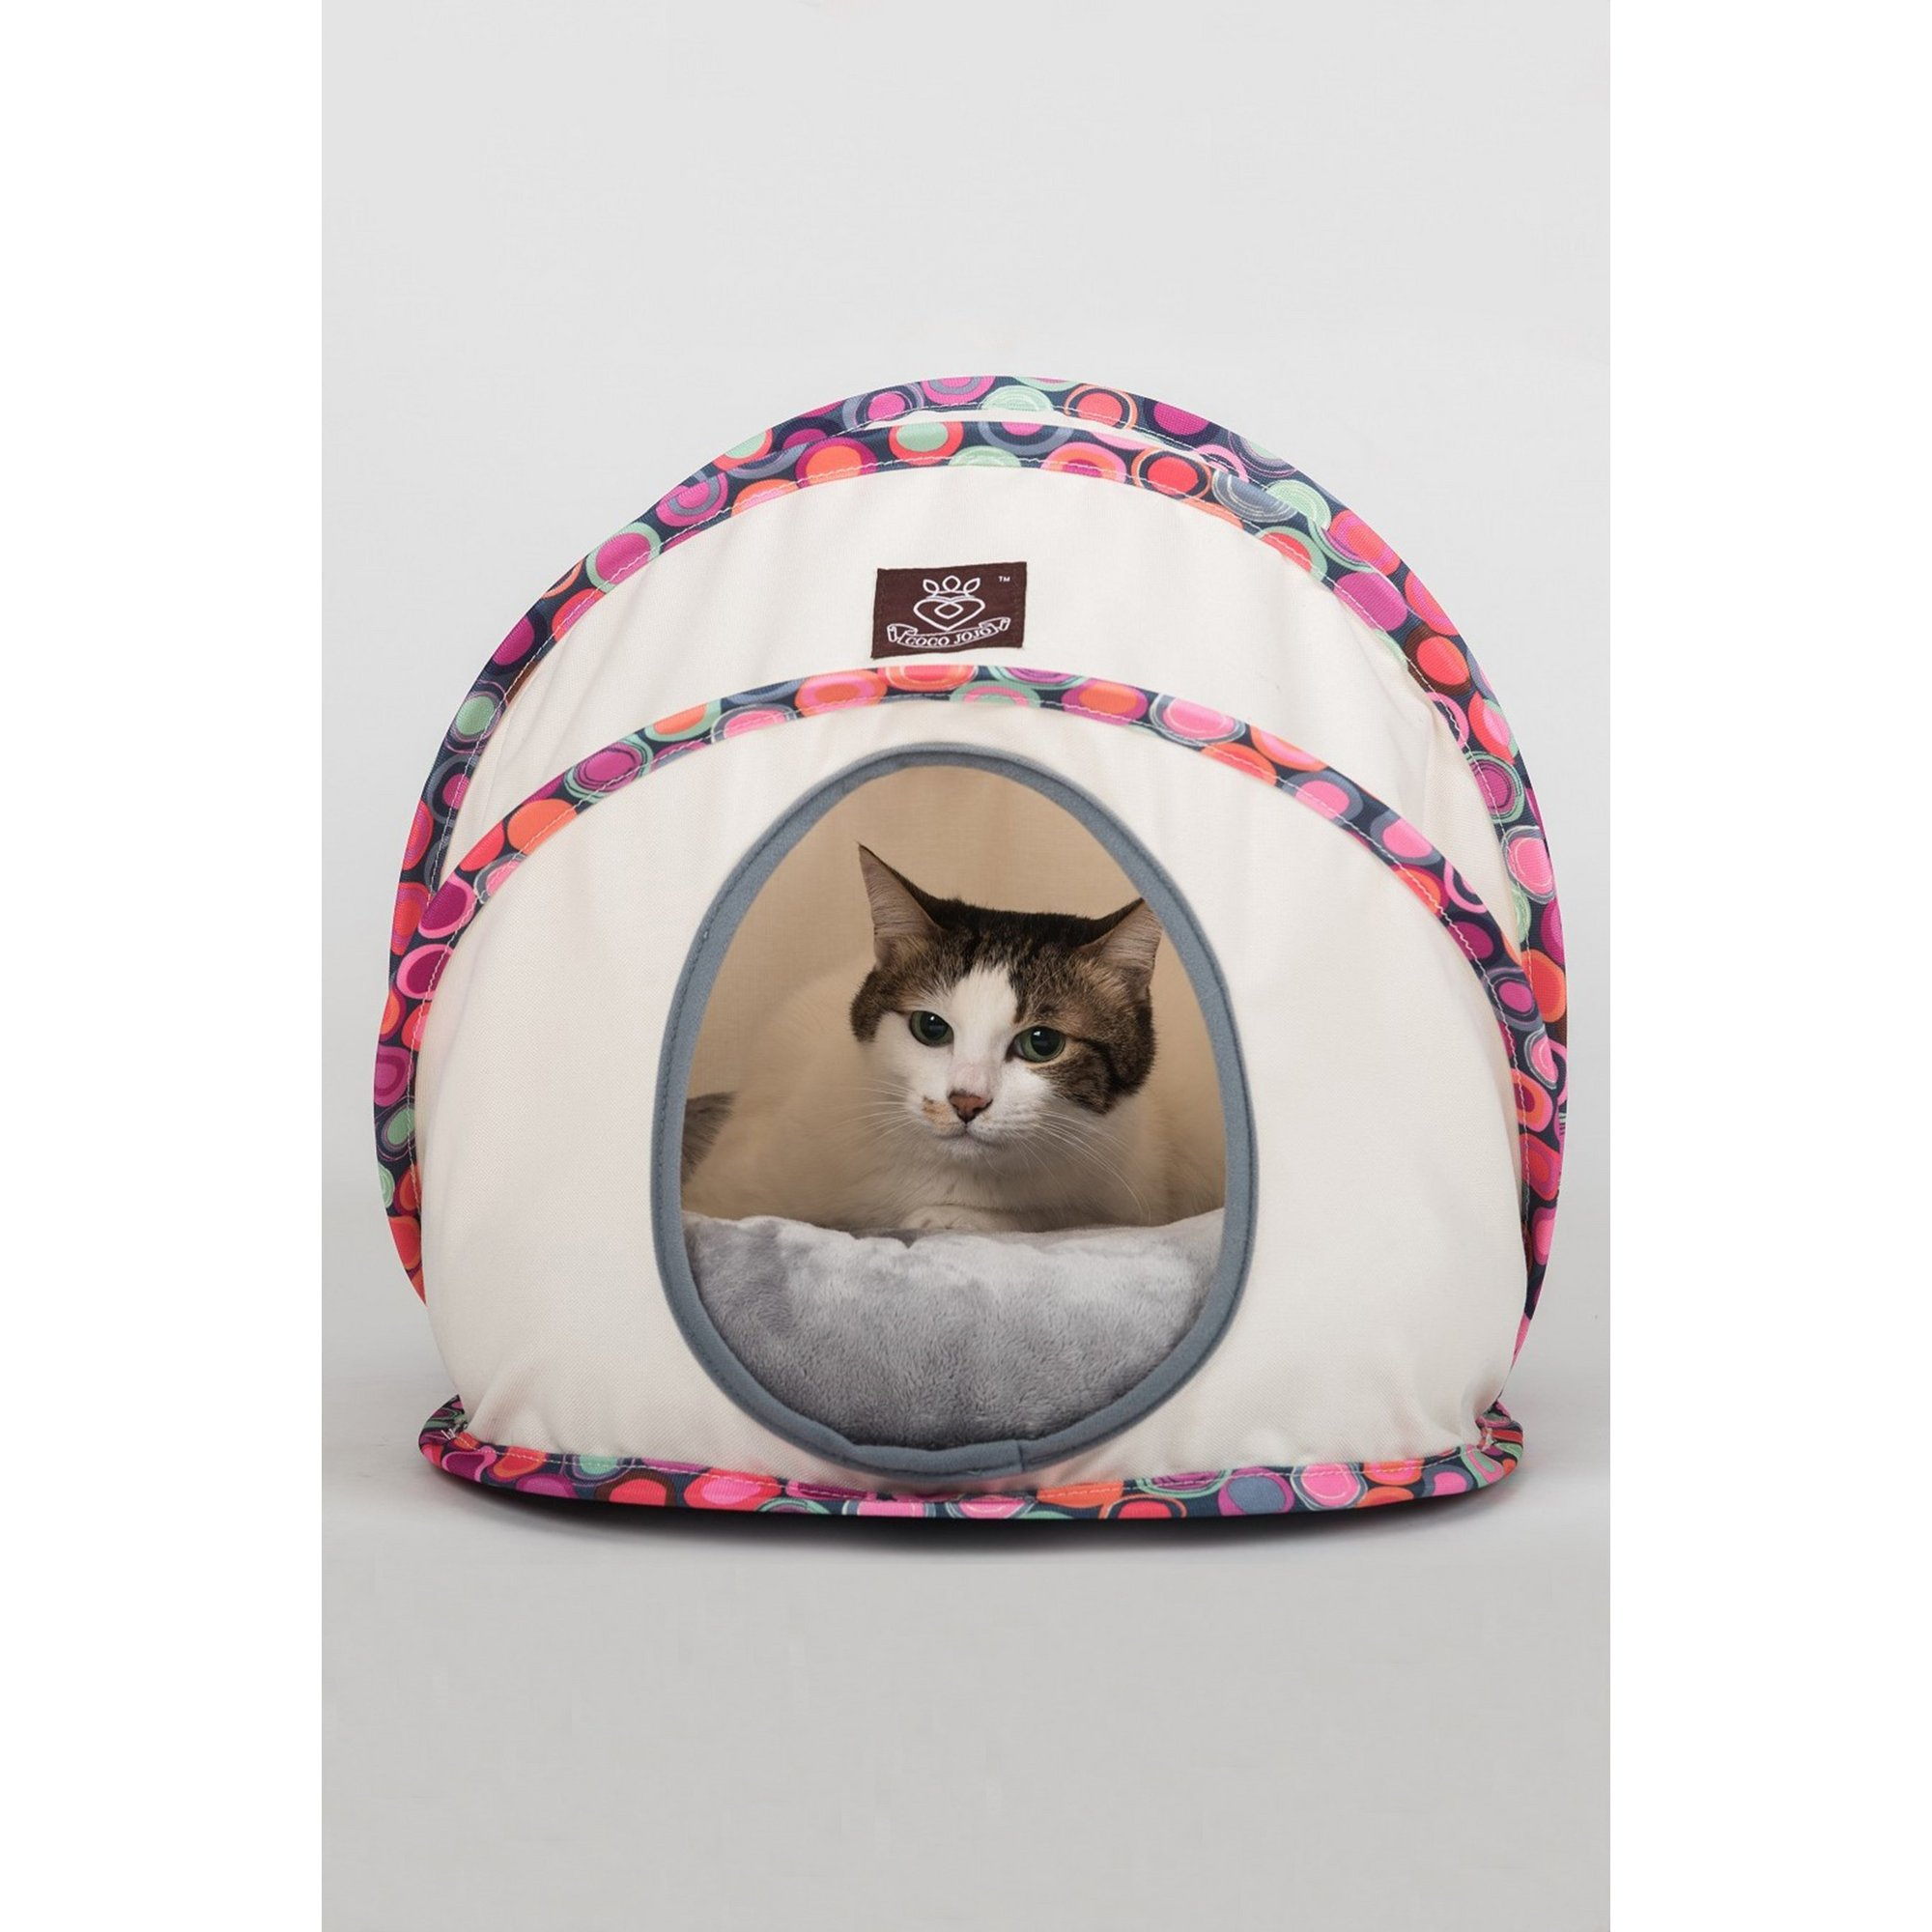 Image of Coco JoJo Pink Pet Cocoon